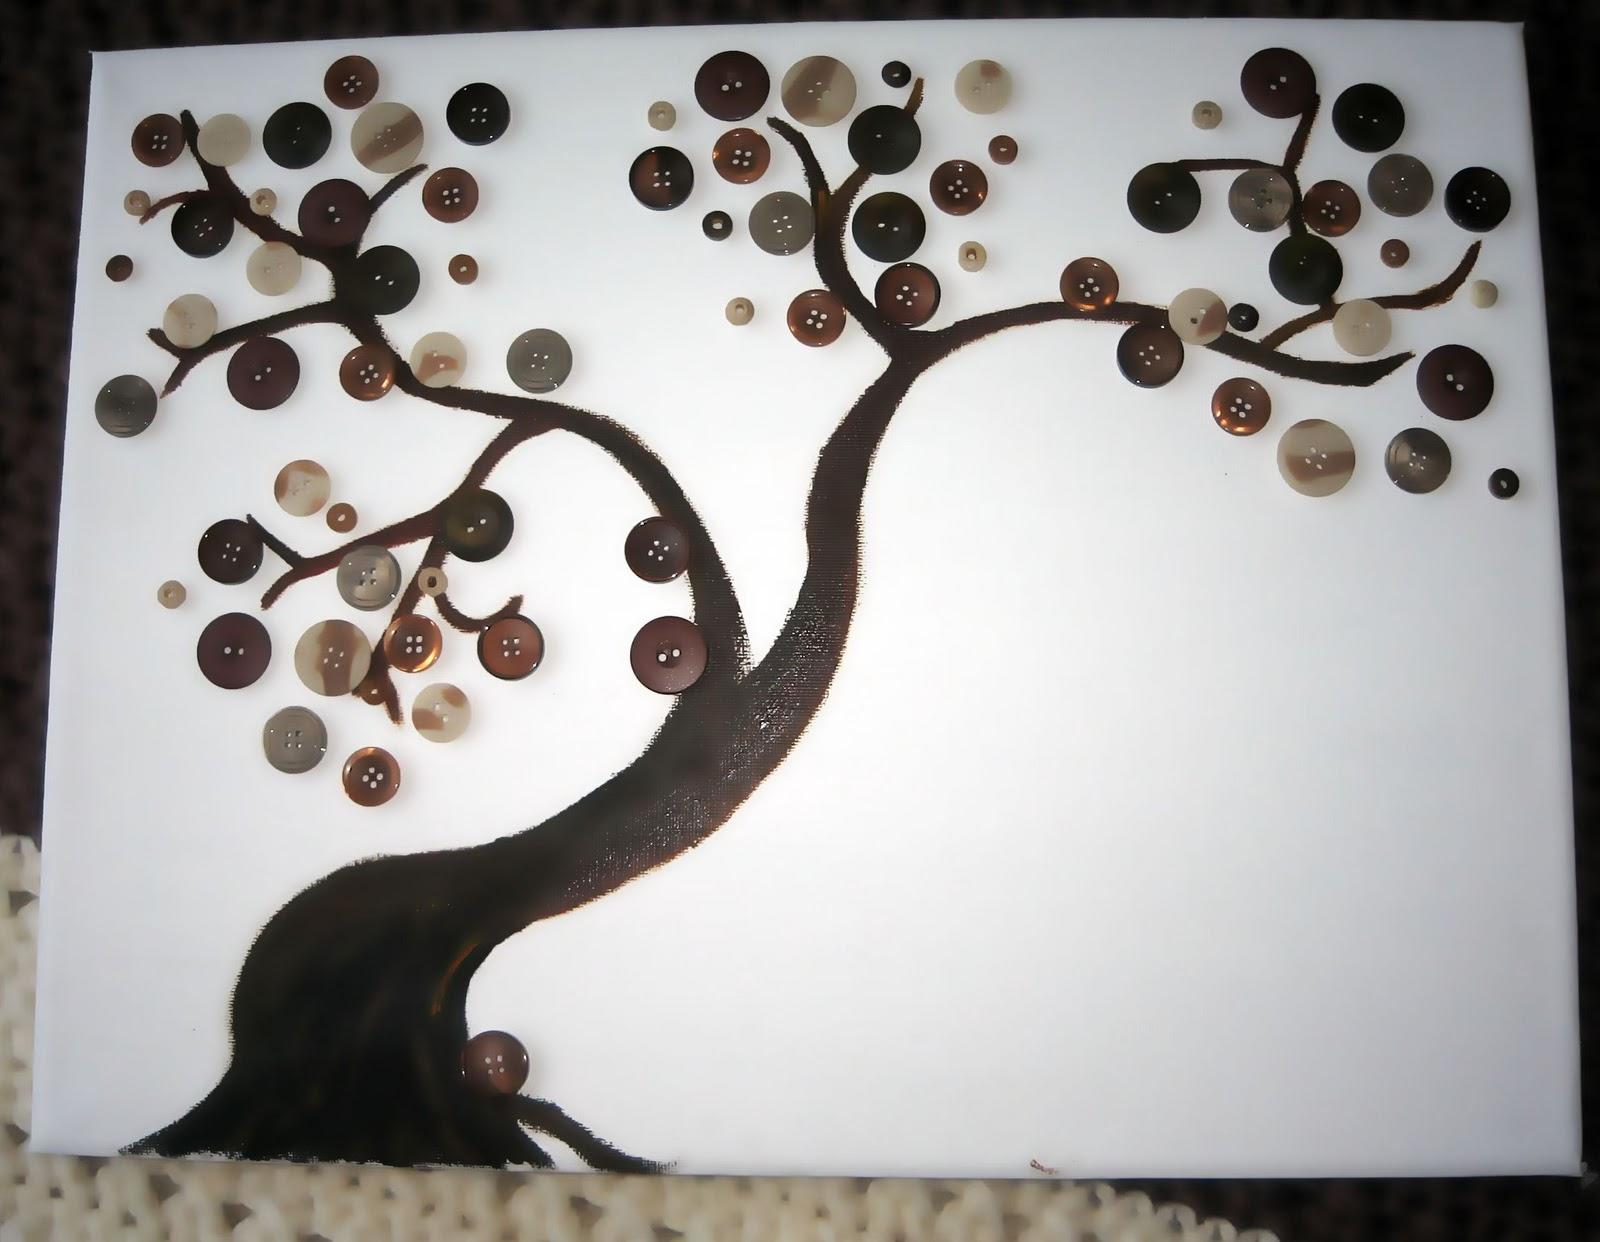 http://2.bp.blogspot.com/-2nyIvzdgBT8/TphuJxaQ4fI/AAAAAAAAAk4/UIKpyGncMRw/s1600/button+tree.jpg